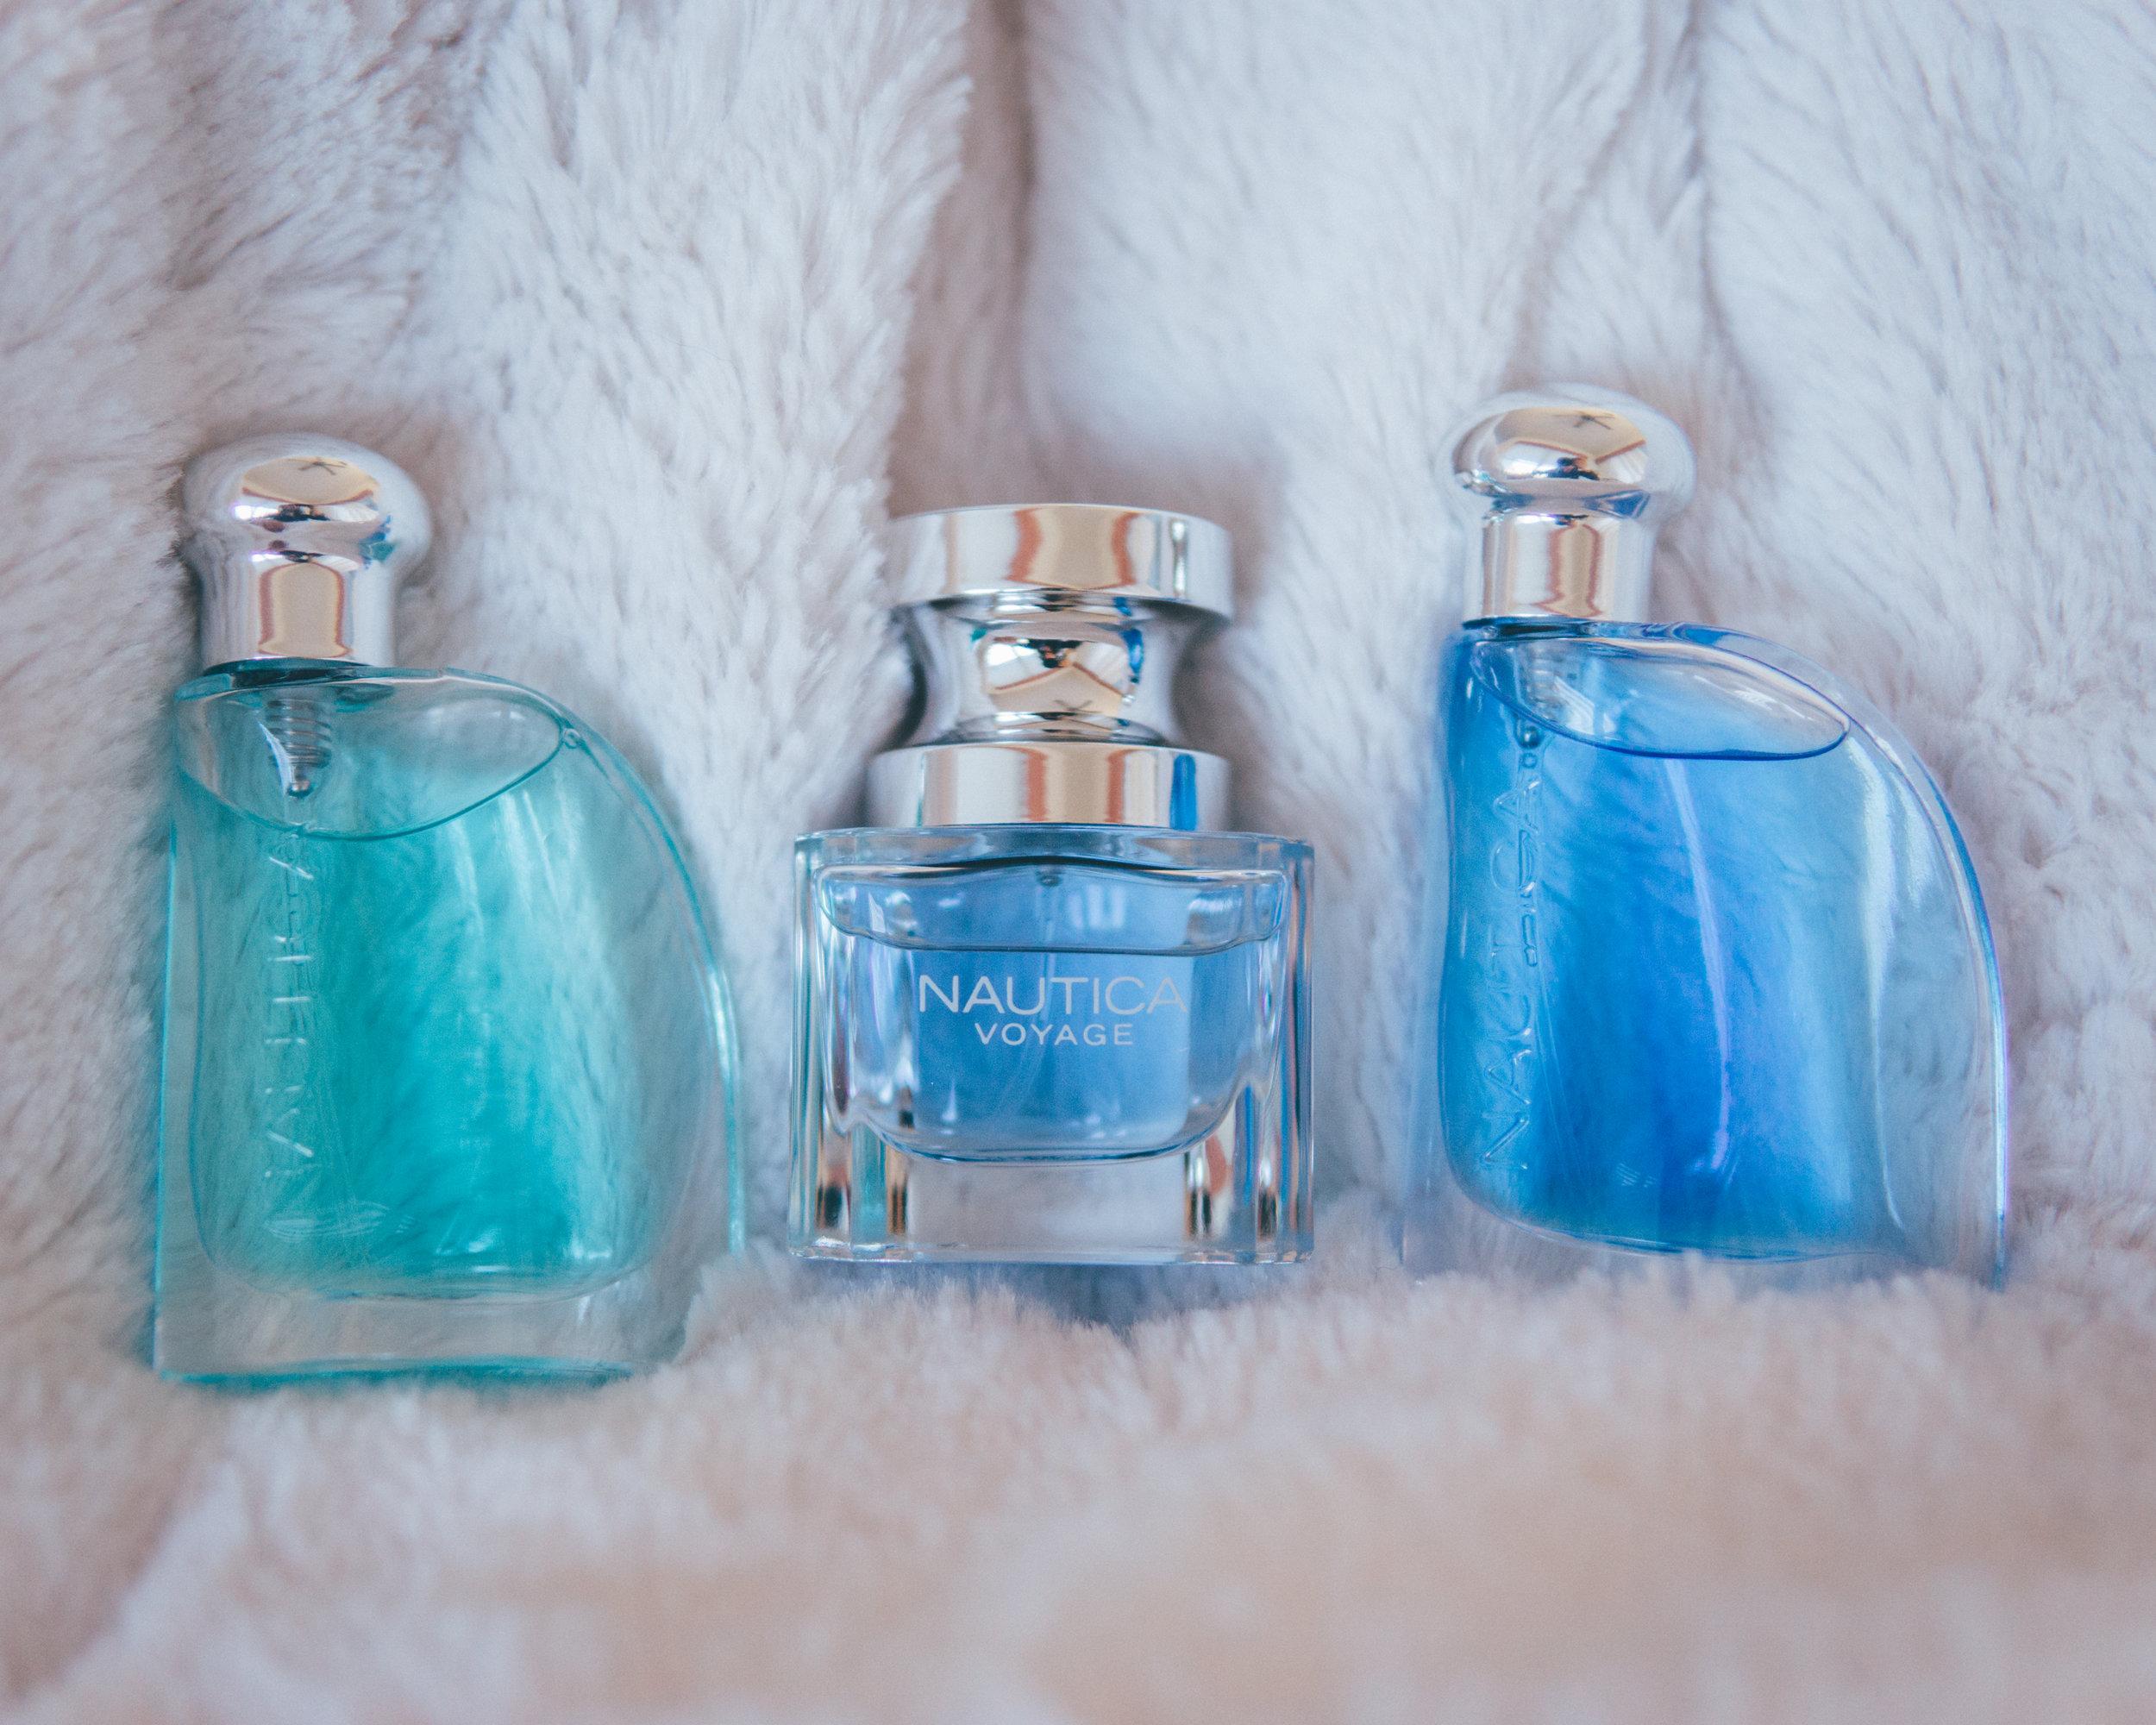 Nautica - Men's Cologne Gift SetHelp him decide on his 2018 fragrance with Nautica Blue, Nautica Voyage & Nautica Classic.